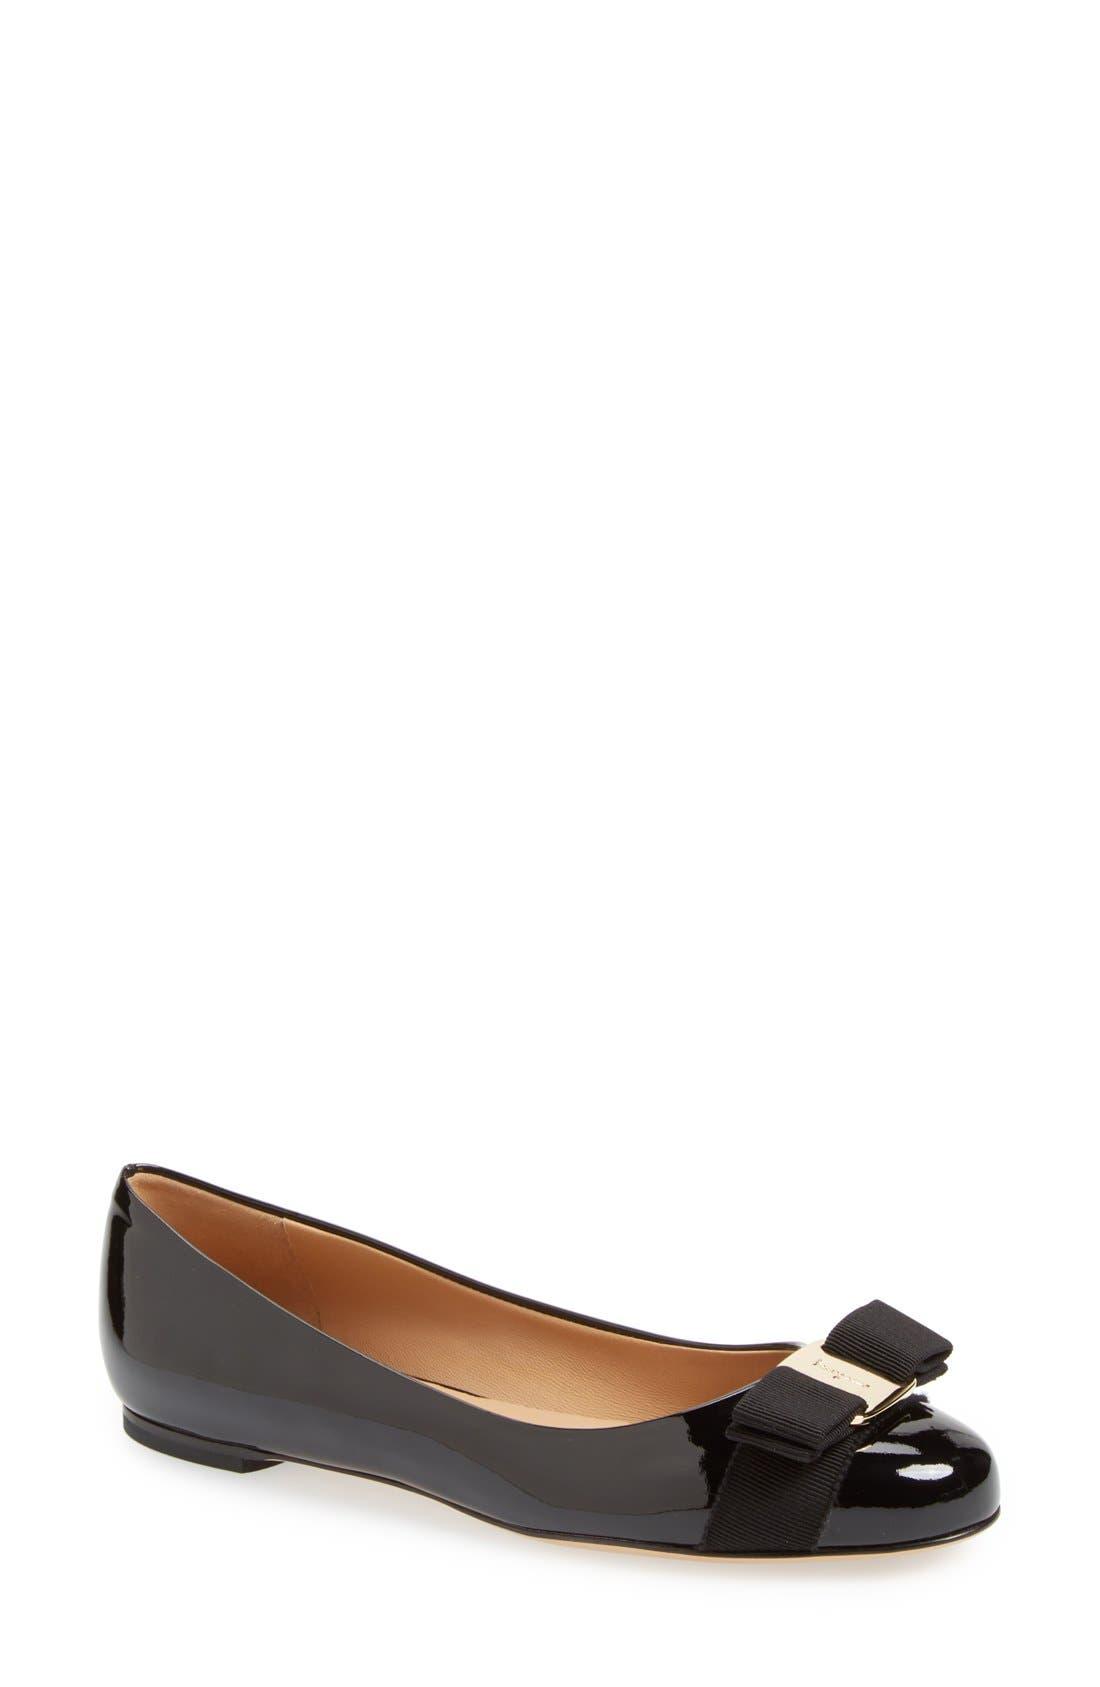 Varina Leather Flat, Main, color, NERO PATENT/ GOLD